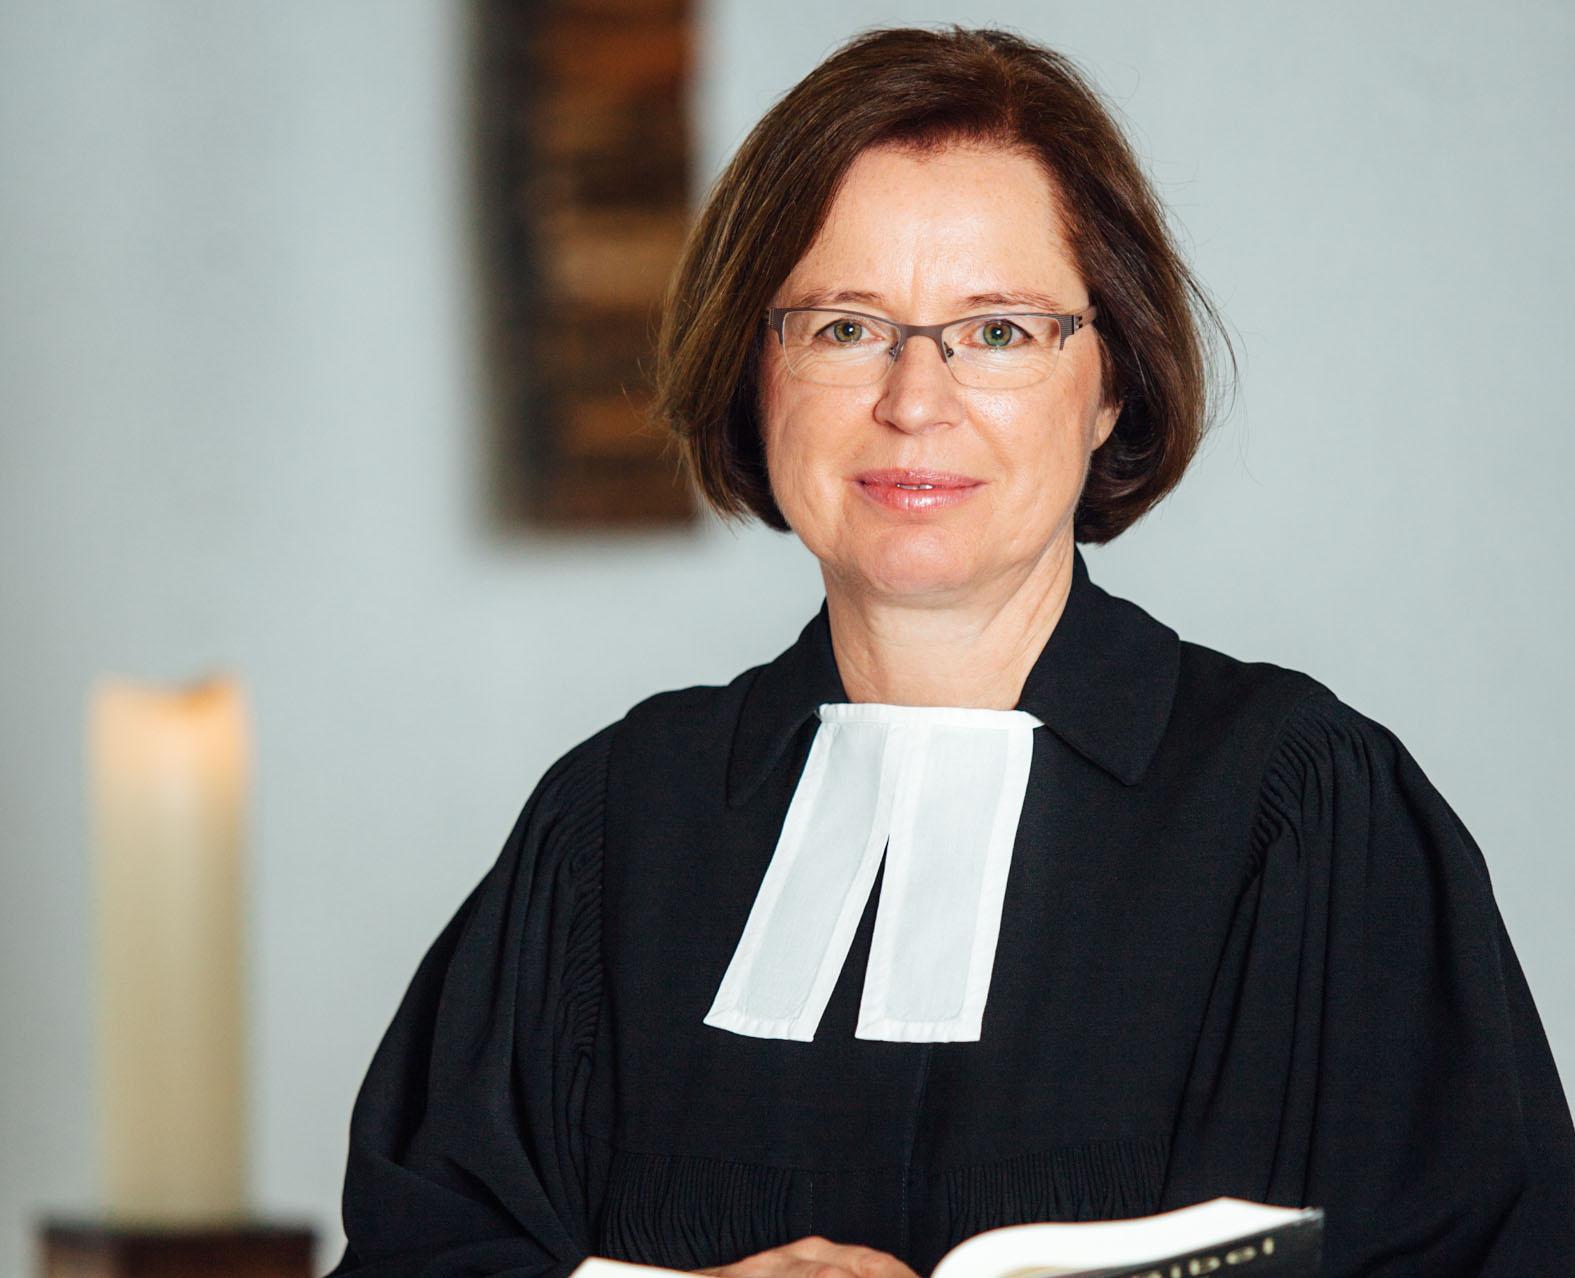 Ulrike Scherf